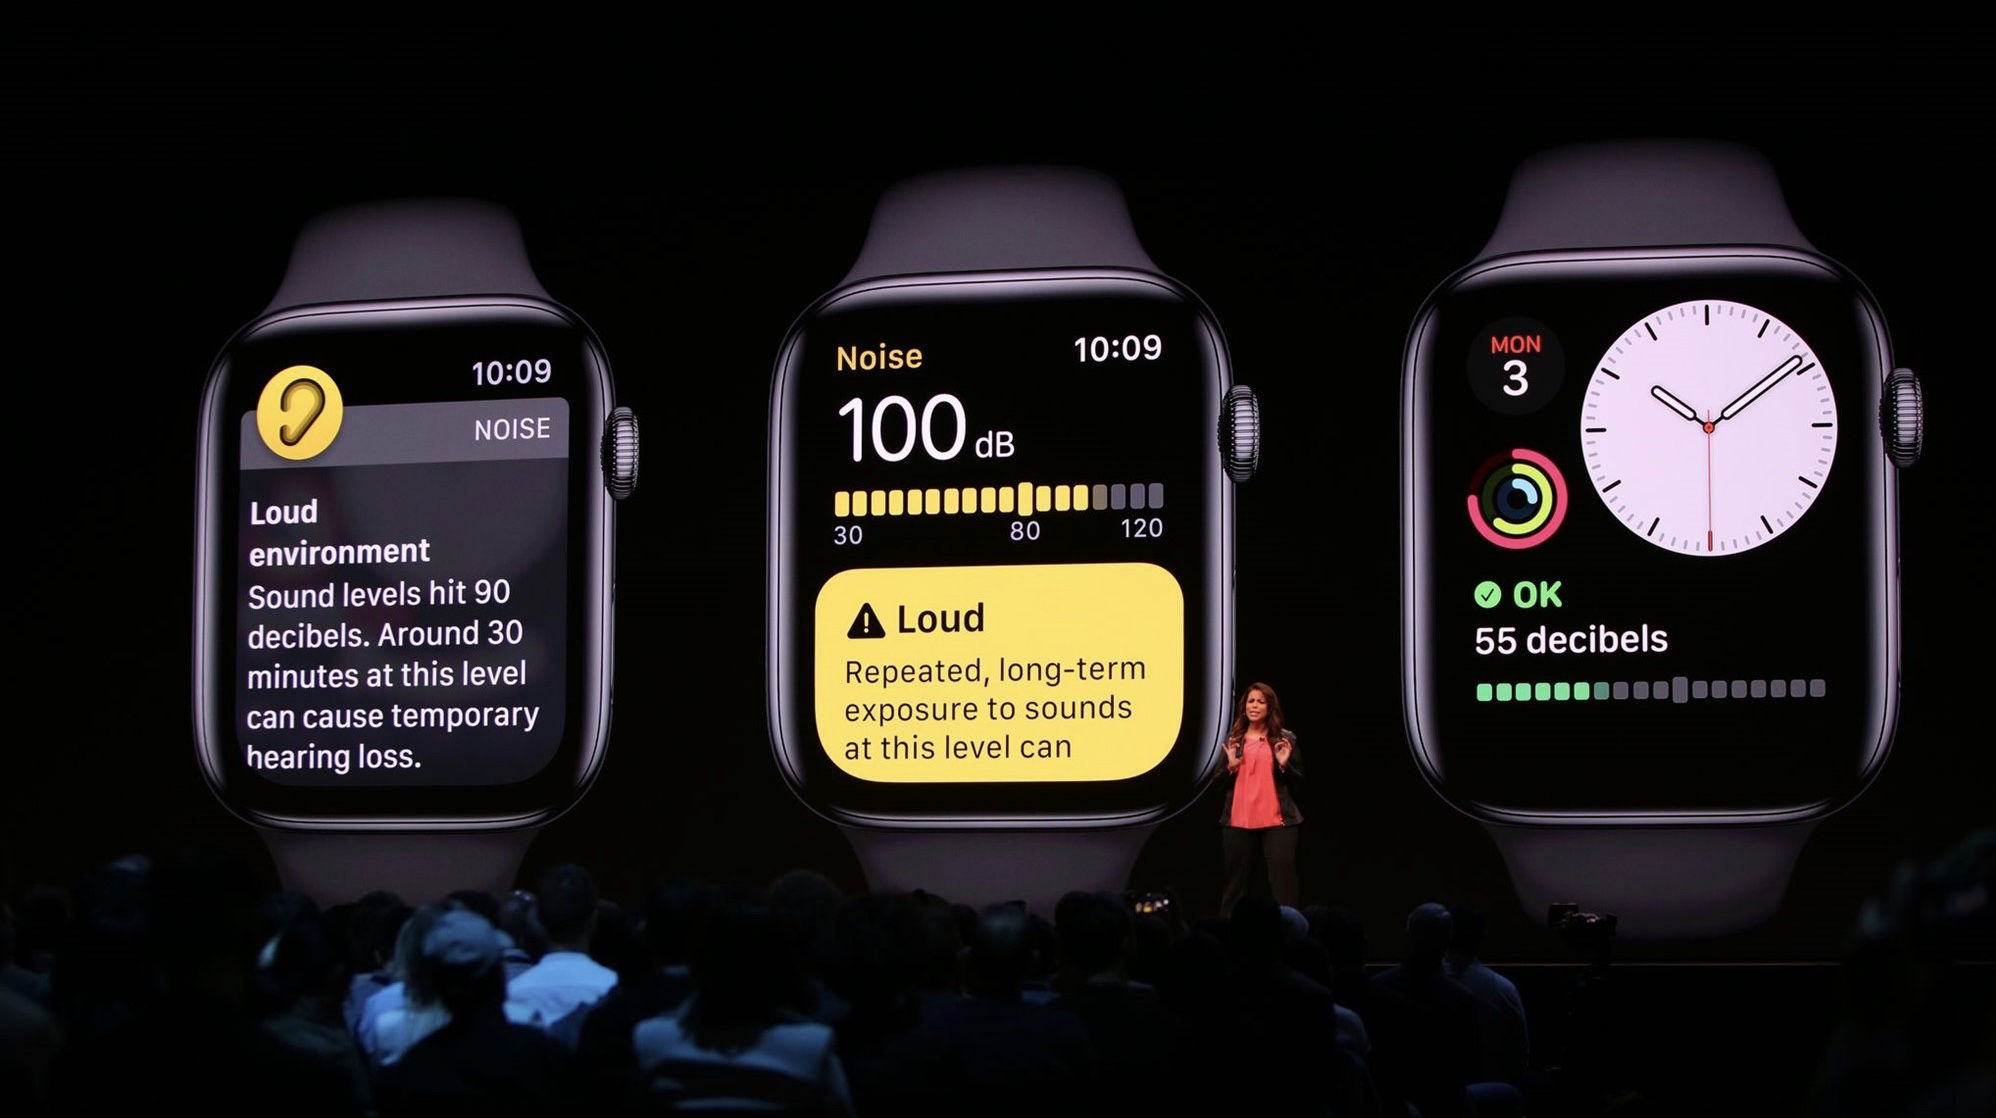 Deeper Dive: Dissecting Apple's WWDC 2019 Keynote Address